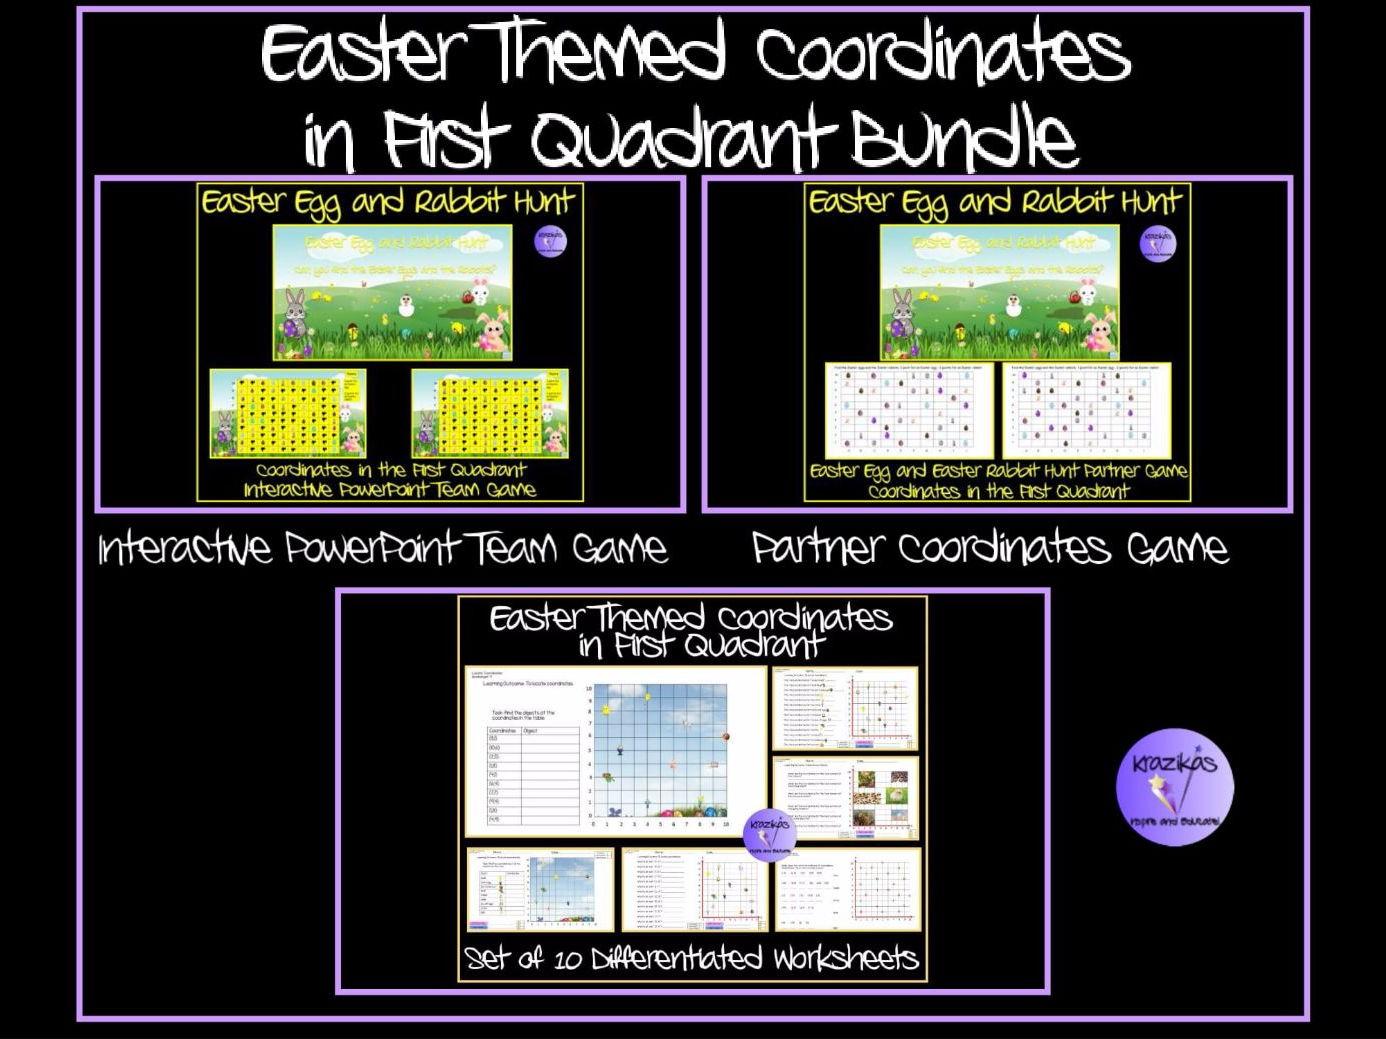 Secondary Algebra Teaching Resources Co Ordinates